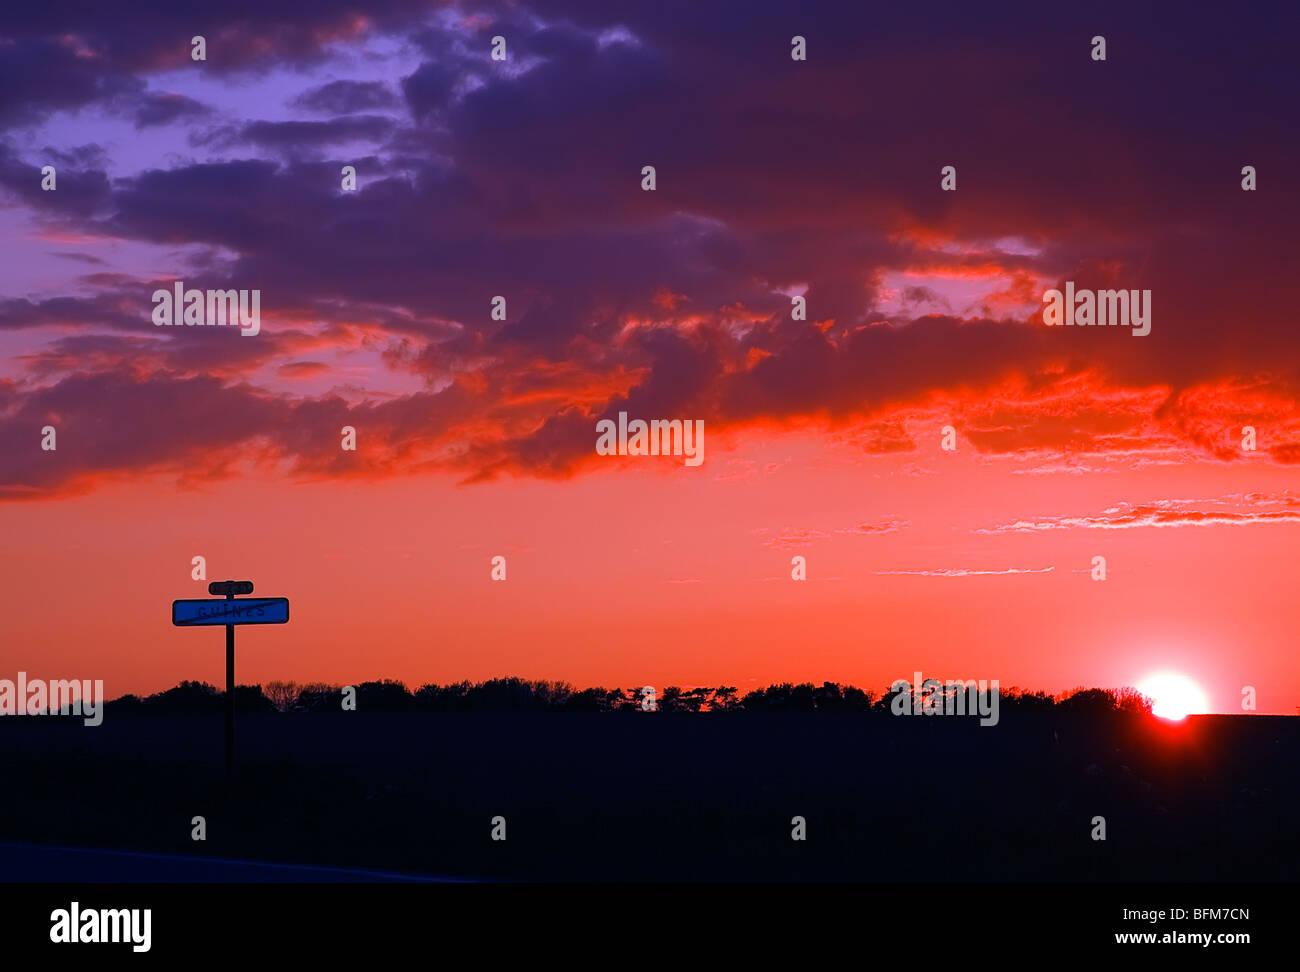 Orange and purple sunset - Stock Image